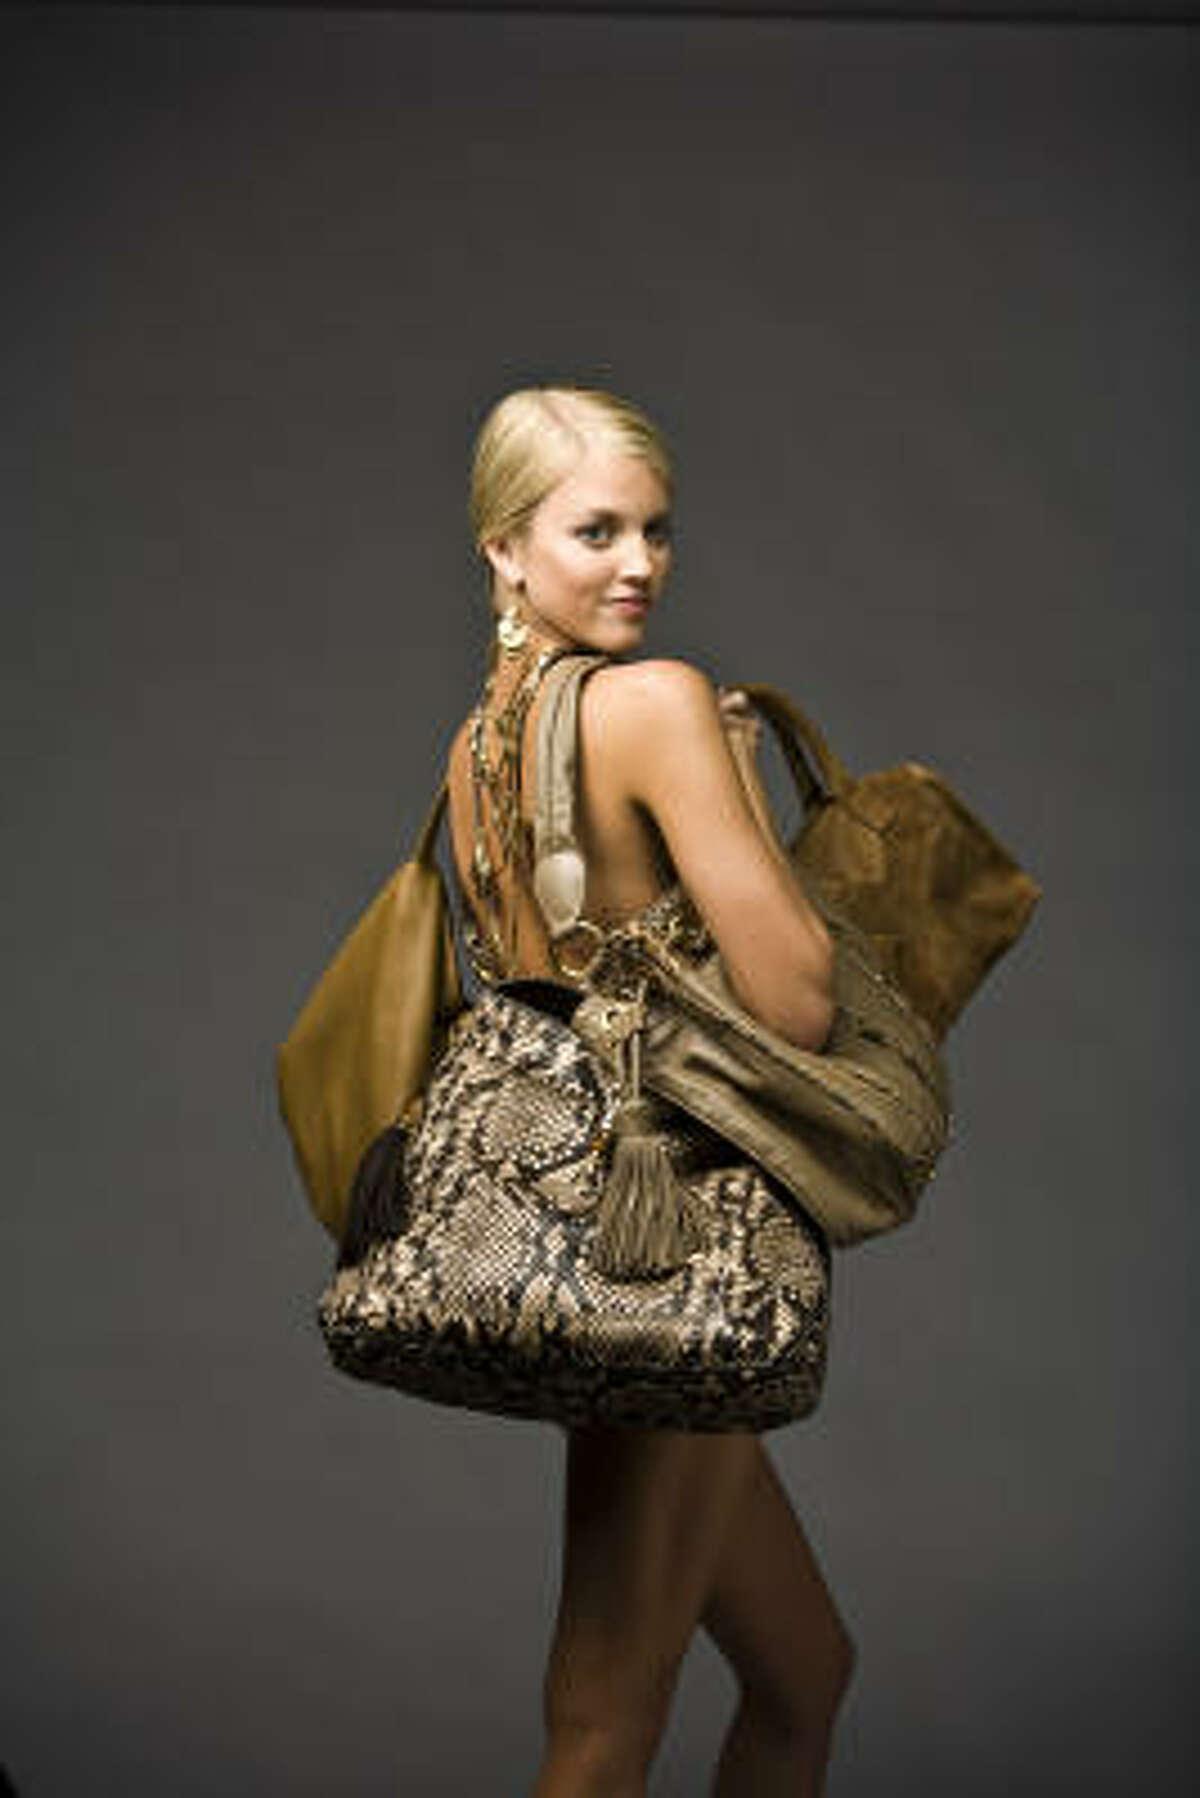 Gucci's anaconda bag, $5,700, Saks Fifth Avenue; Lenny e Cia's beaver and python drawstring bag, $3,300 Lenny e Cia; Valentino's large 360 bag in brown; Yves Saint Laurent's small